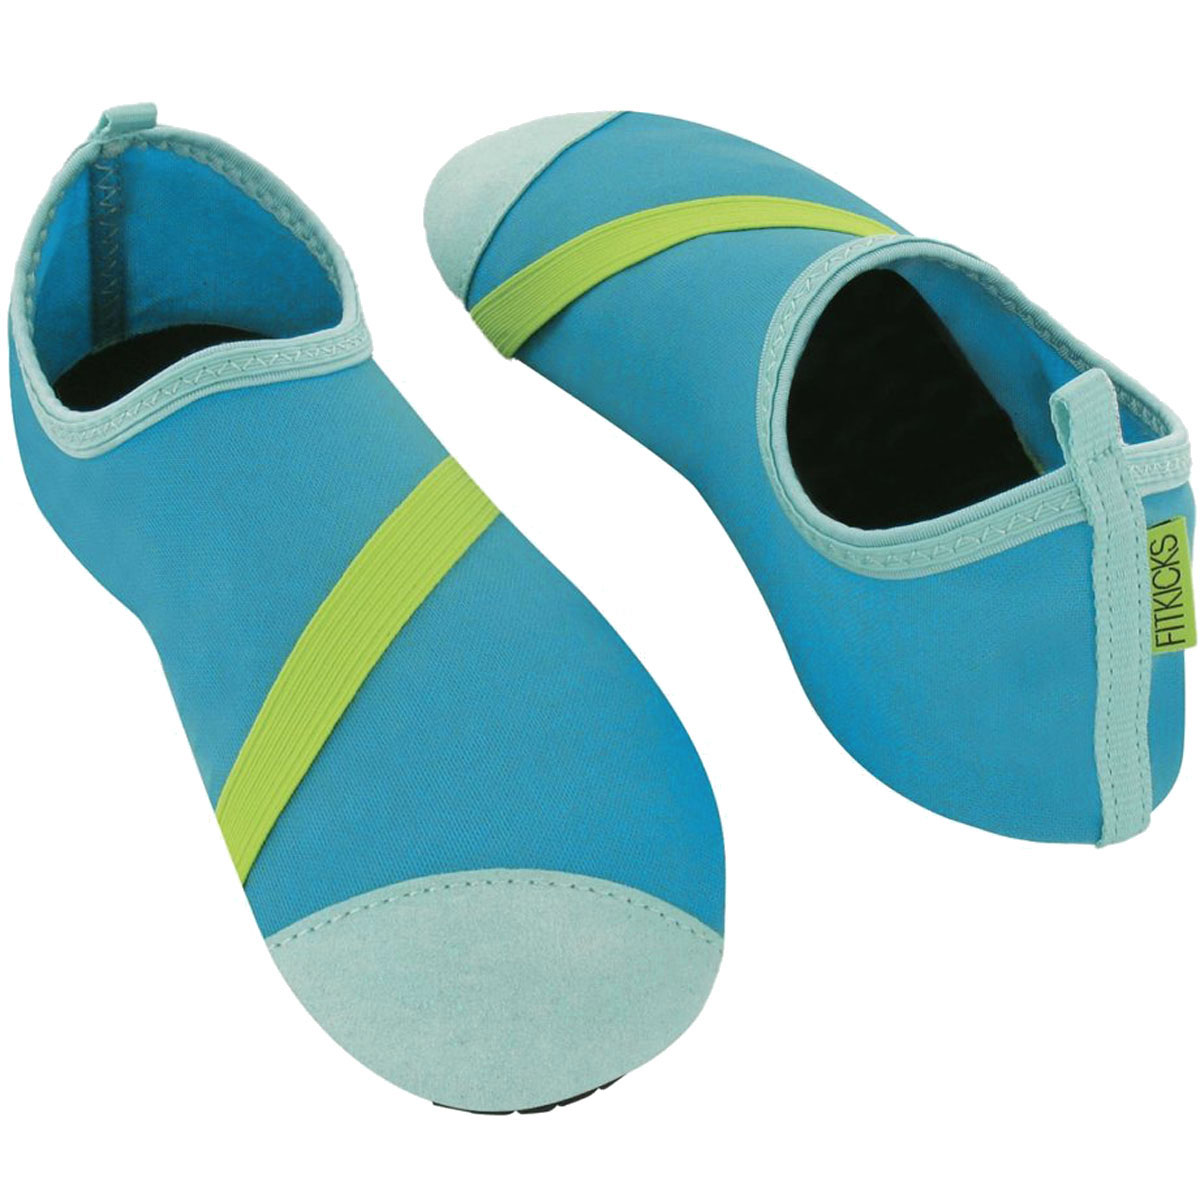 FitKicks-Women-039-s-Non-Slip-Sole-Active-Footwear thumbnail 34